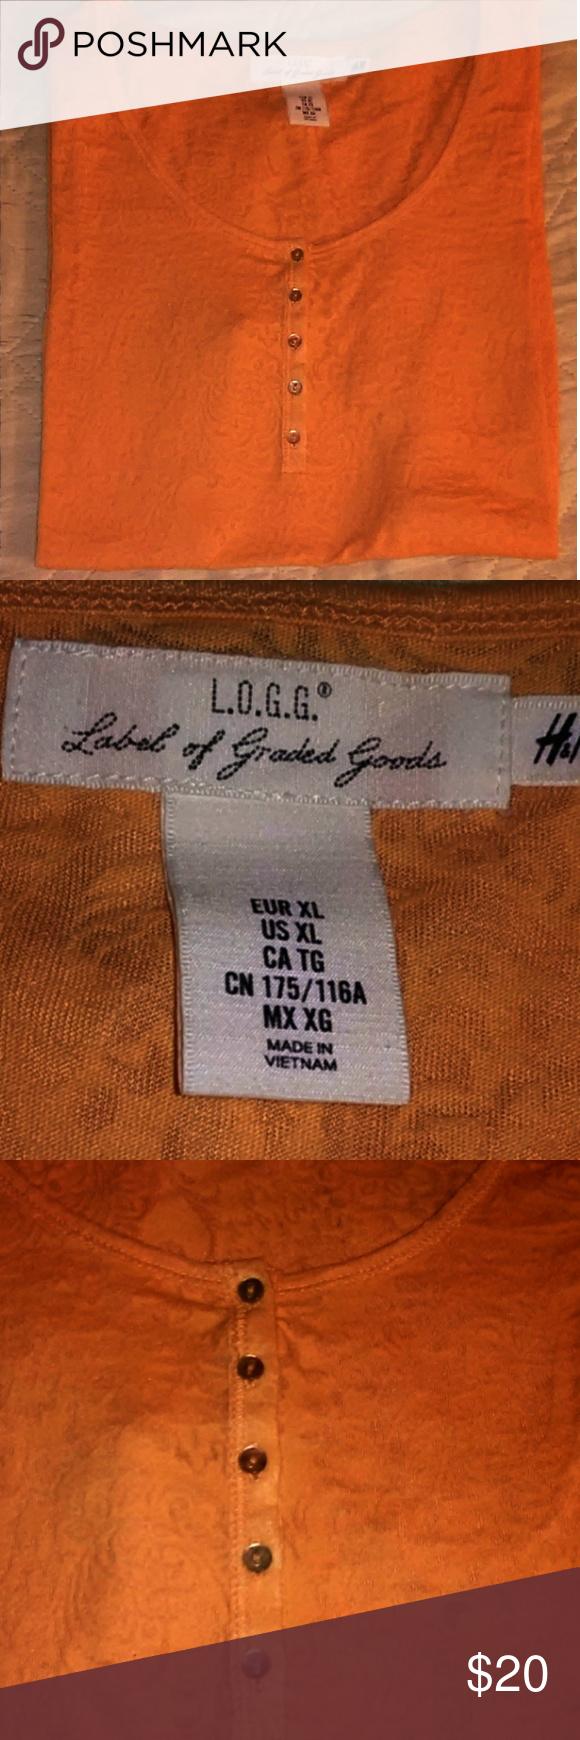 H&M L.O.G.G. XL Peach burn-out style S/S Top | Tops, Style ...